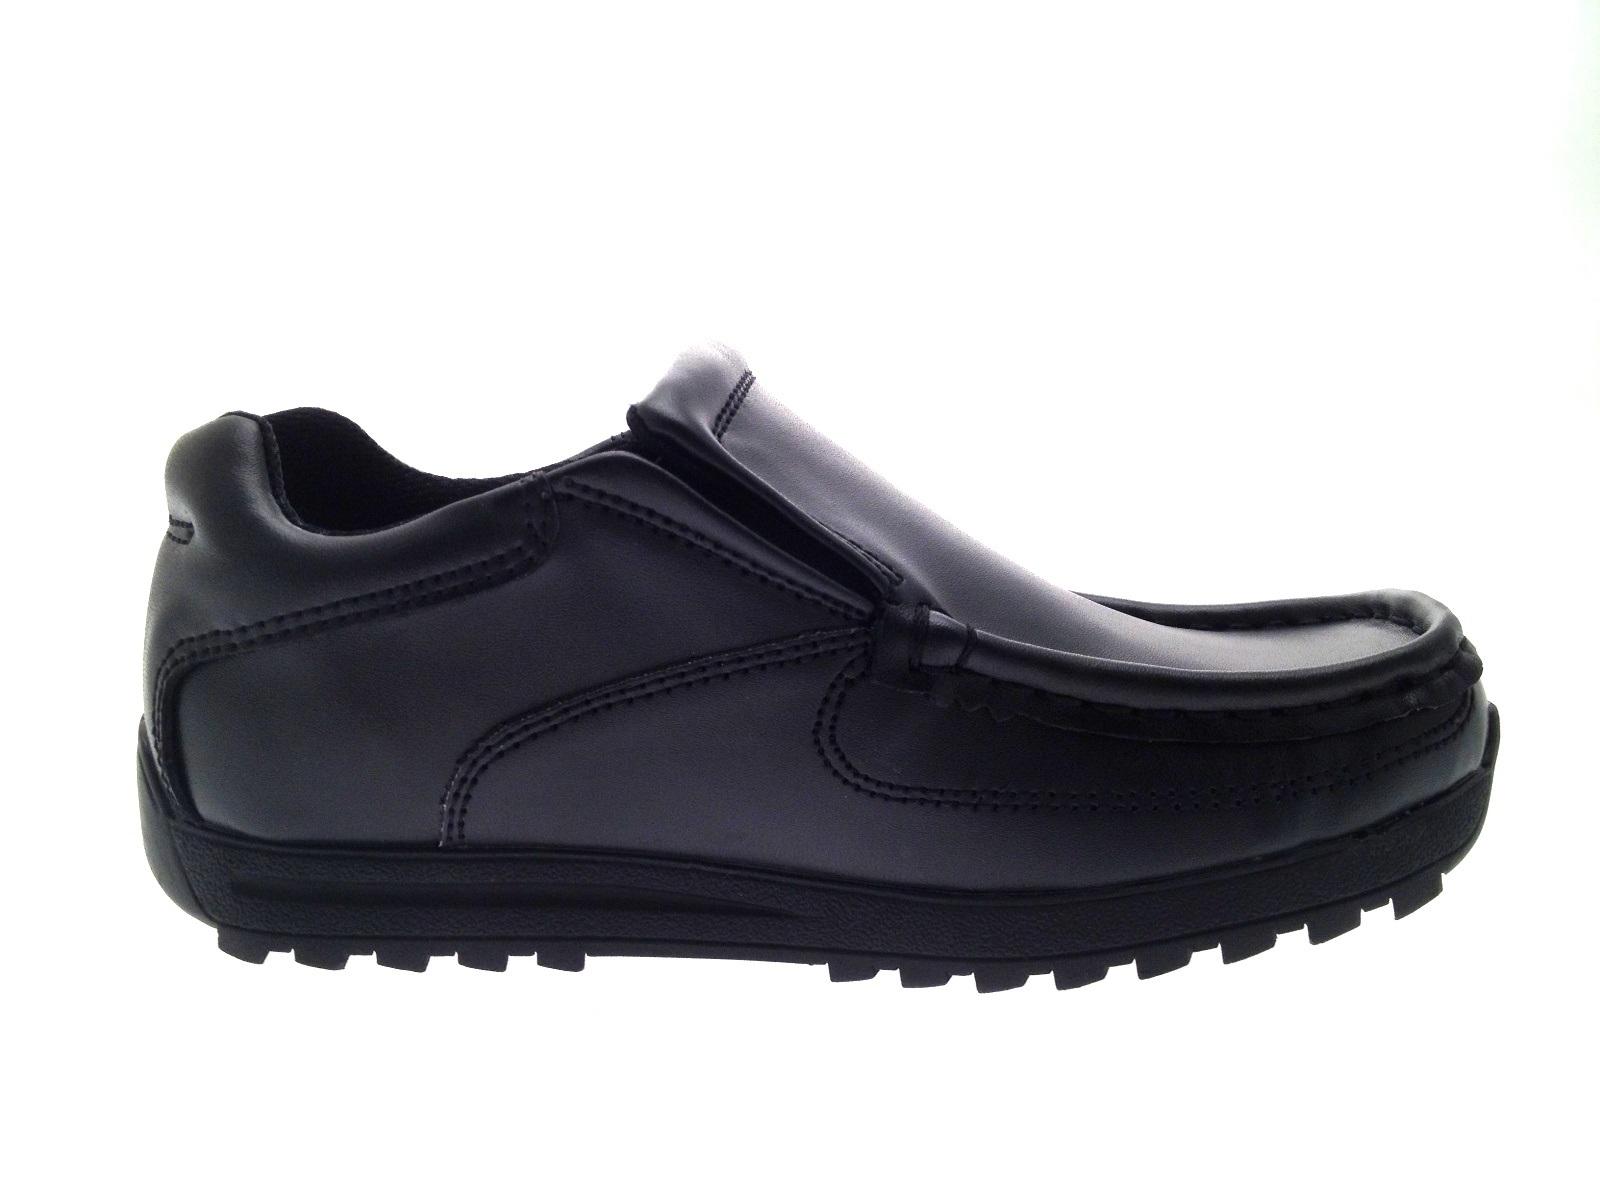 Mens Boys Kids Black Leather School Shoes Work Loafers Formal Shoes Size UK 2-11   EBay